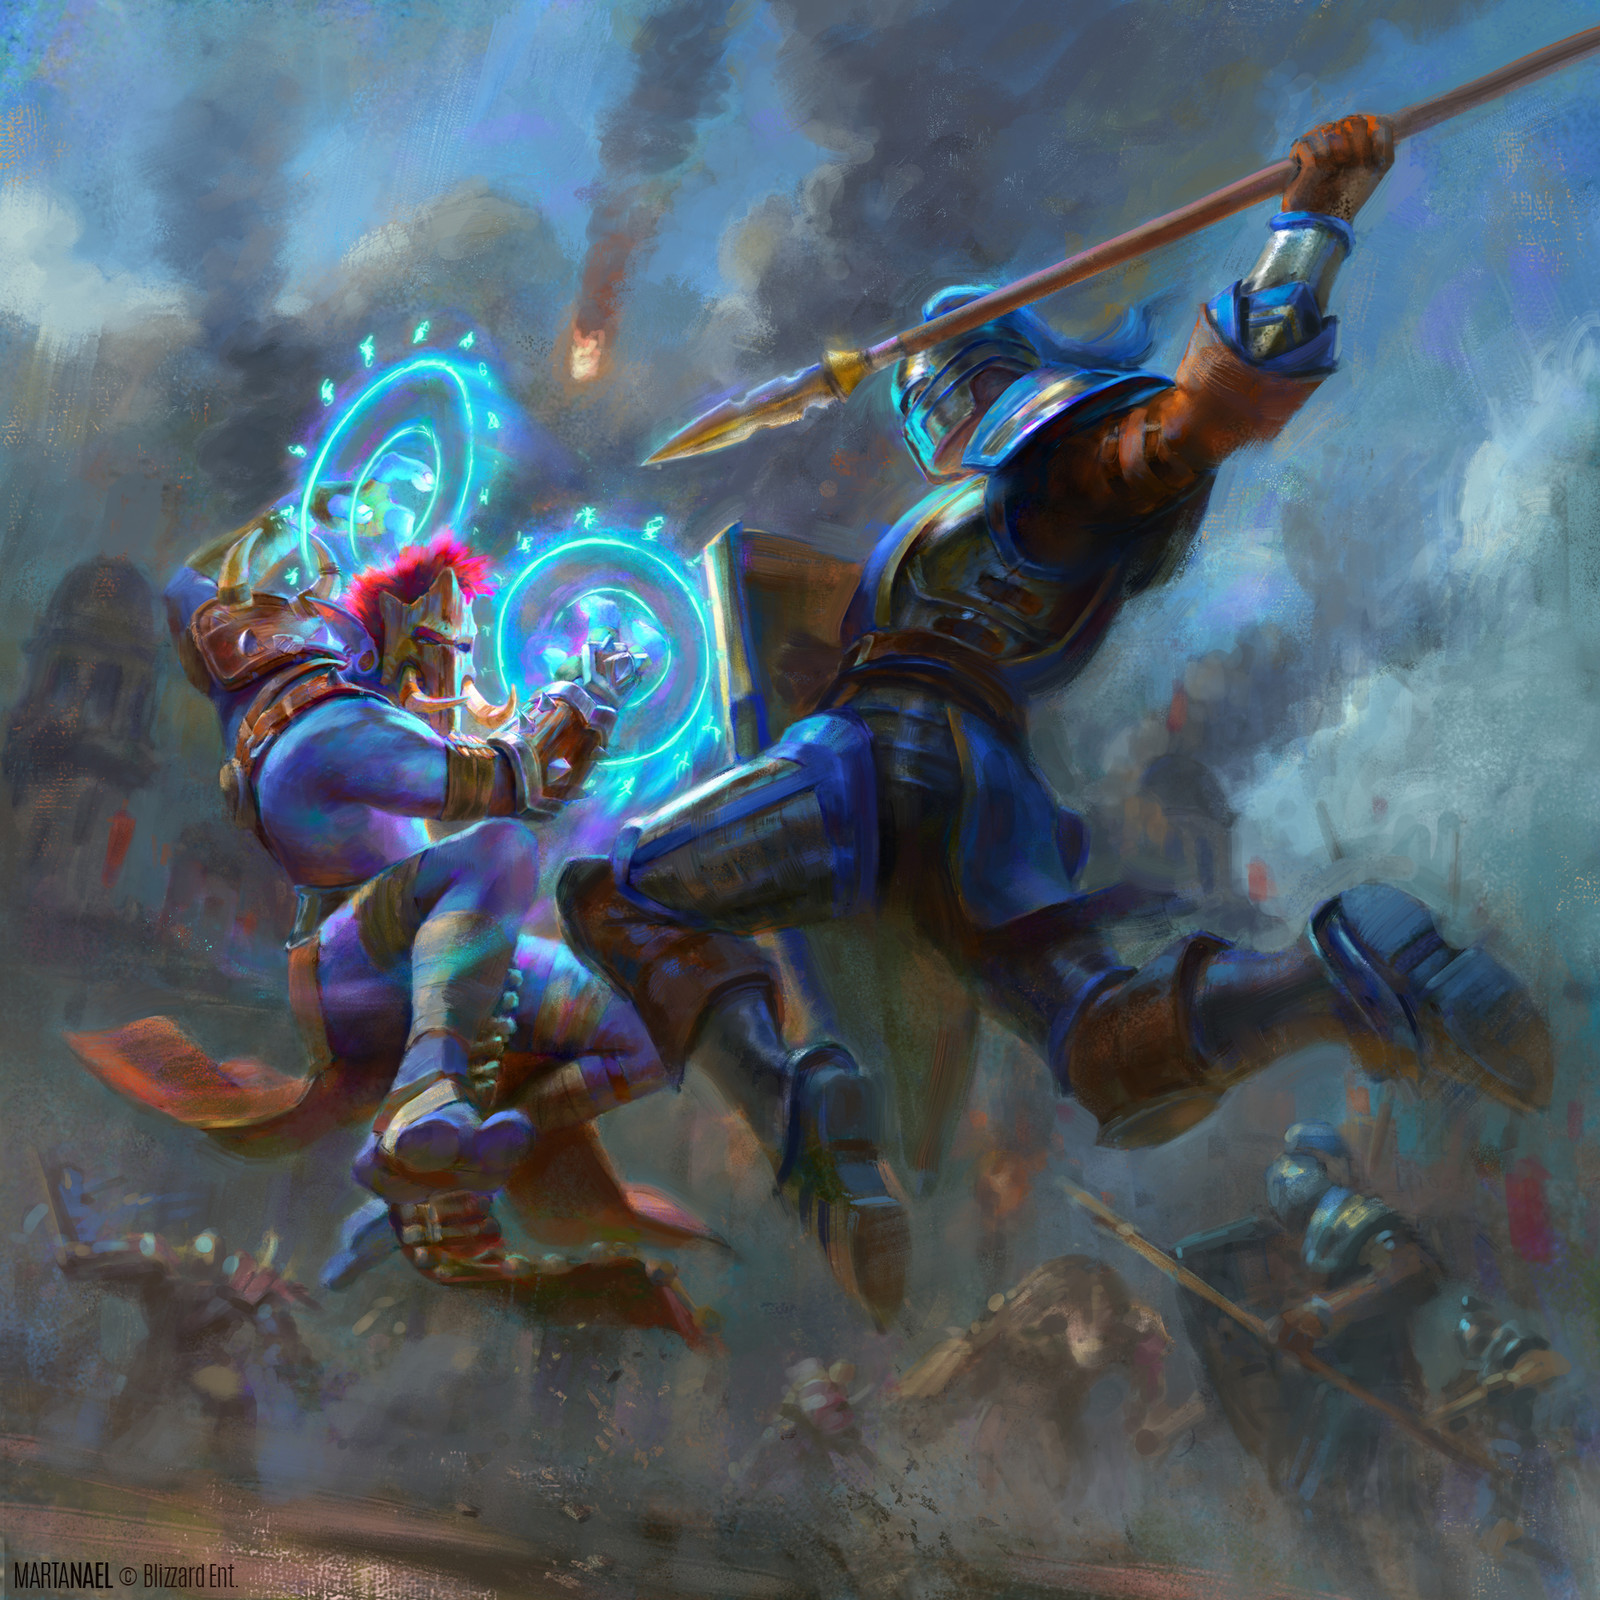 Troll vs Footman warrior - Battle for Azeroth promo art